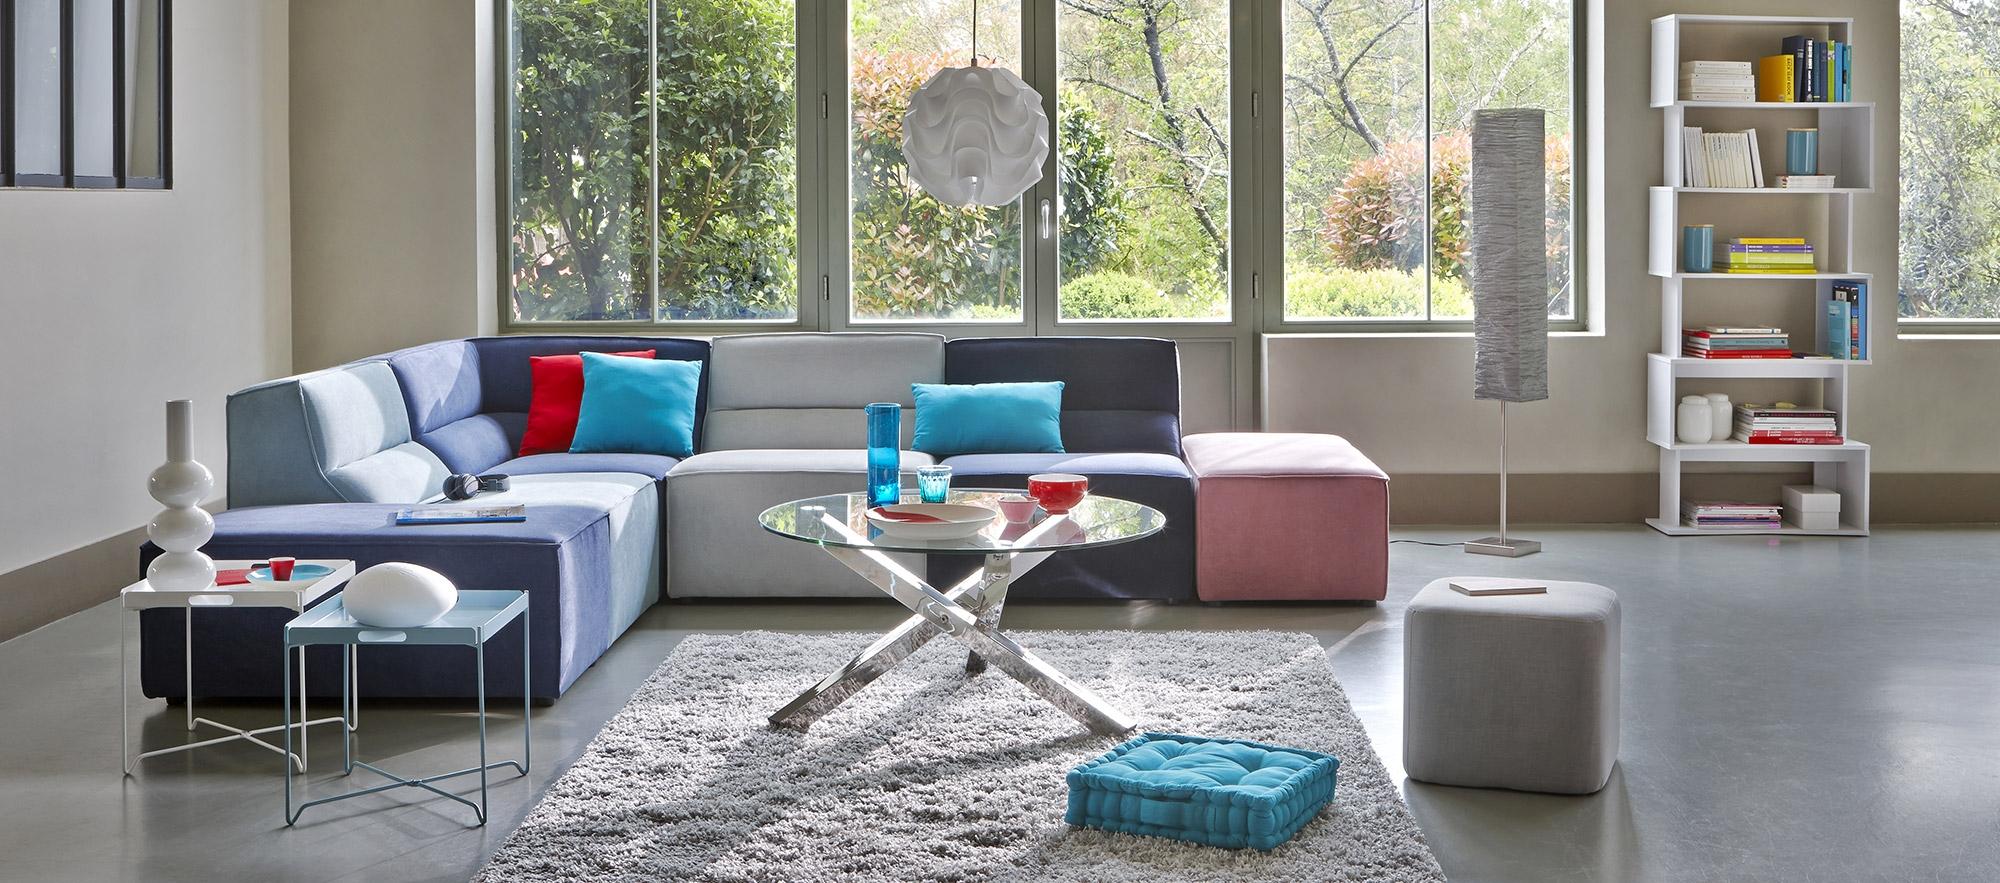 salon sjour game color sjour allure moderne - Salon Moderne But